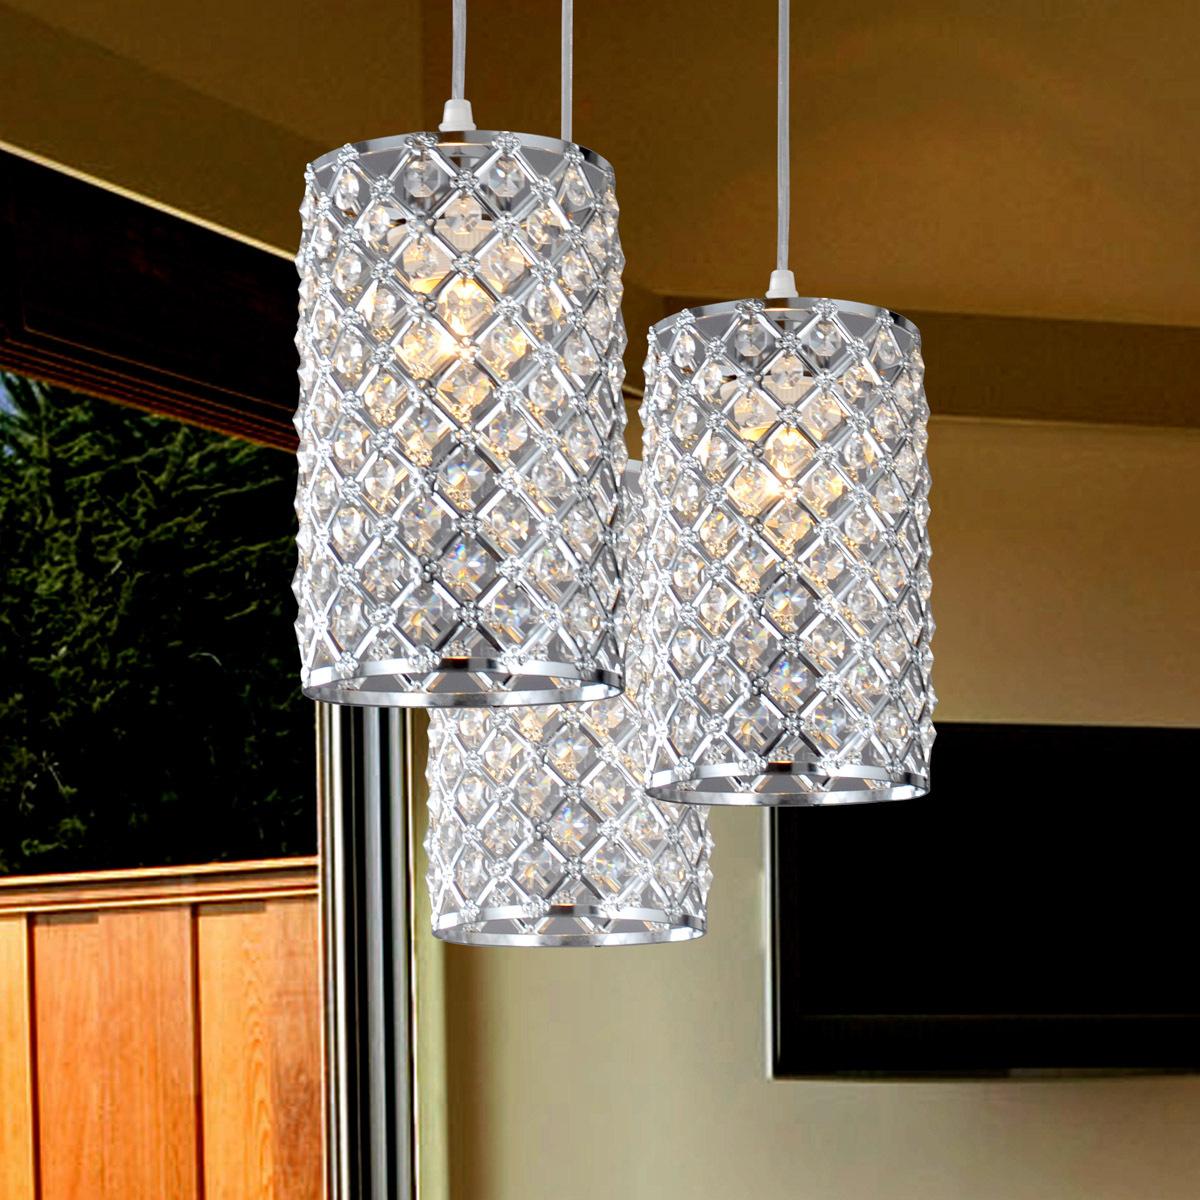 Crystal Pendant Lights Over Kitchen Island 1200 x 1200